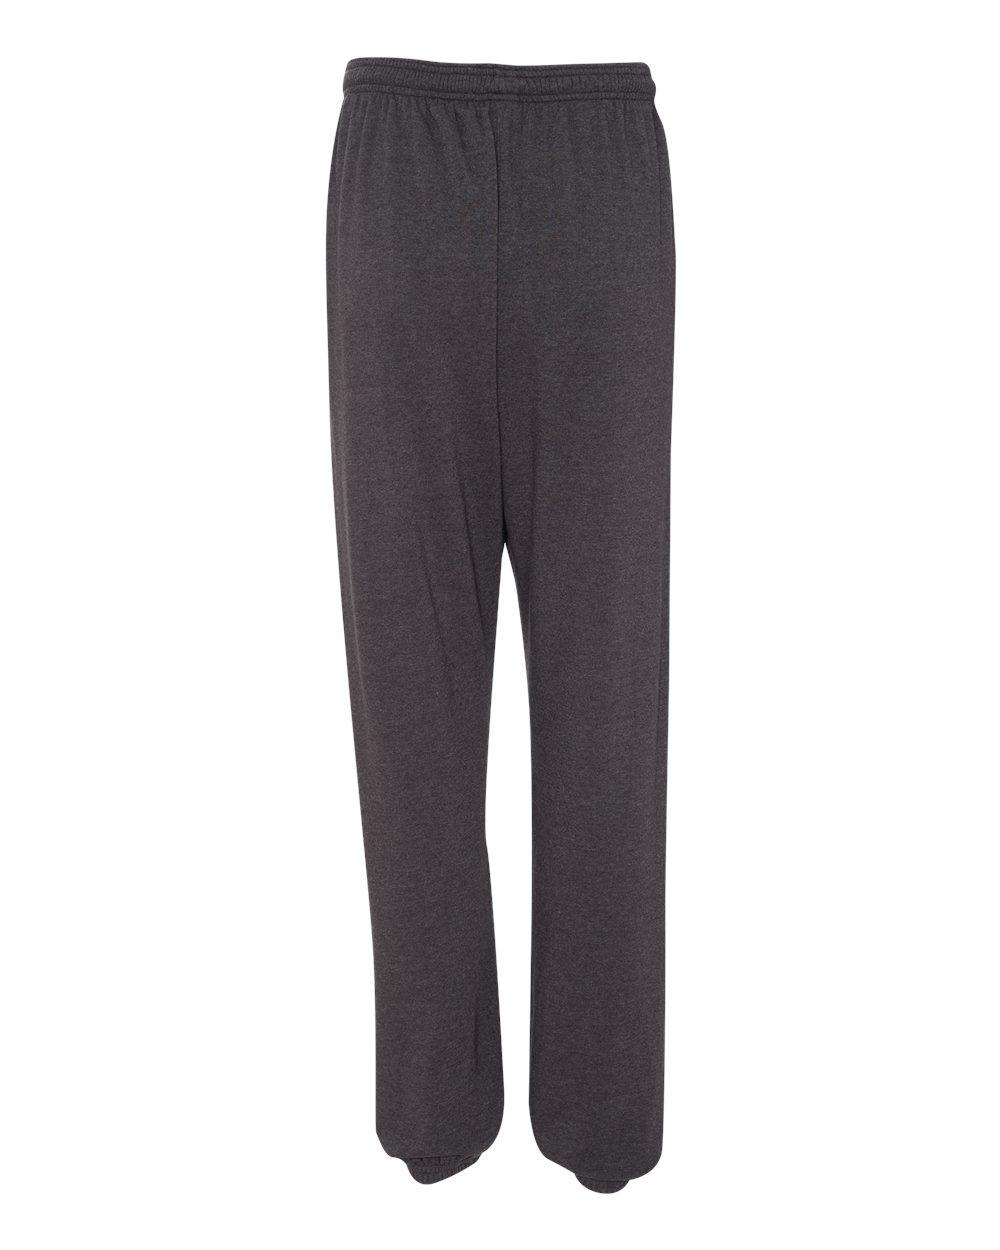 Bella-Canvas-Unisex-Long-Scrunch-Fleece-Pants-Workout-3737-up-to-2XL thumbnail 10